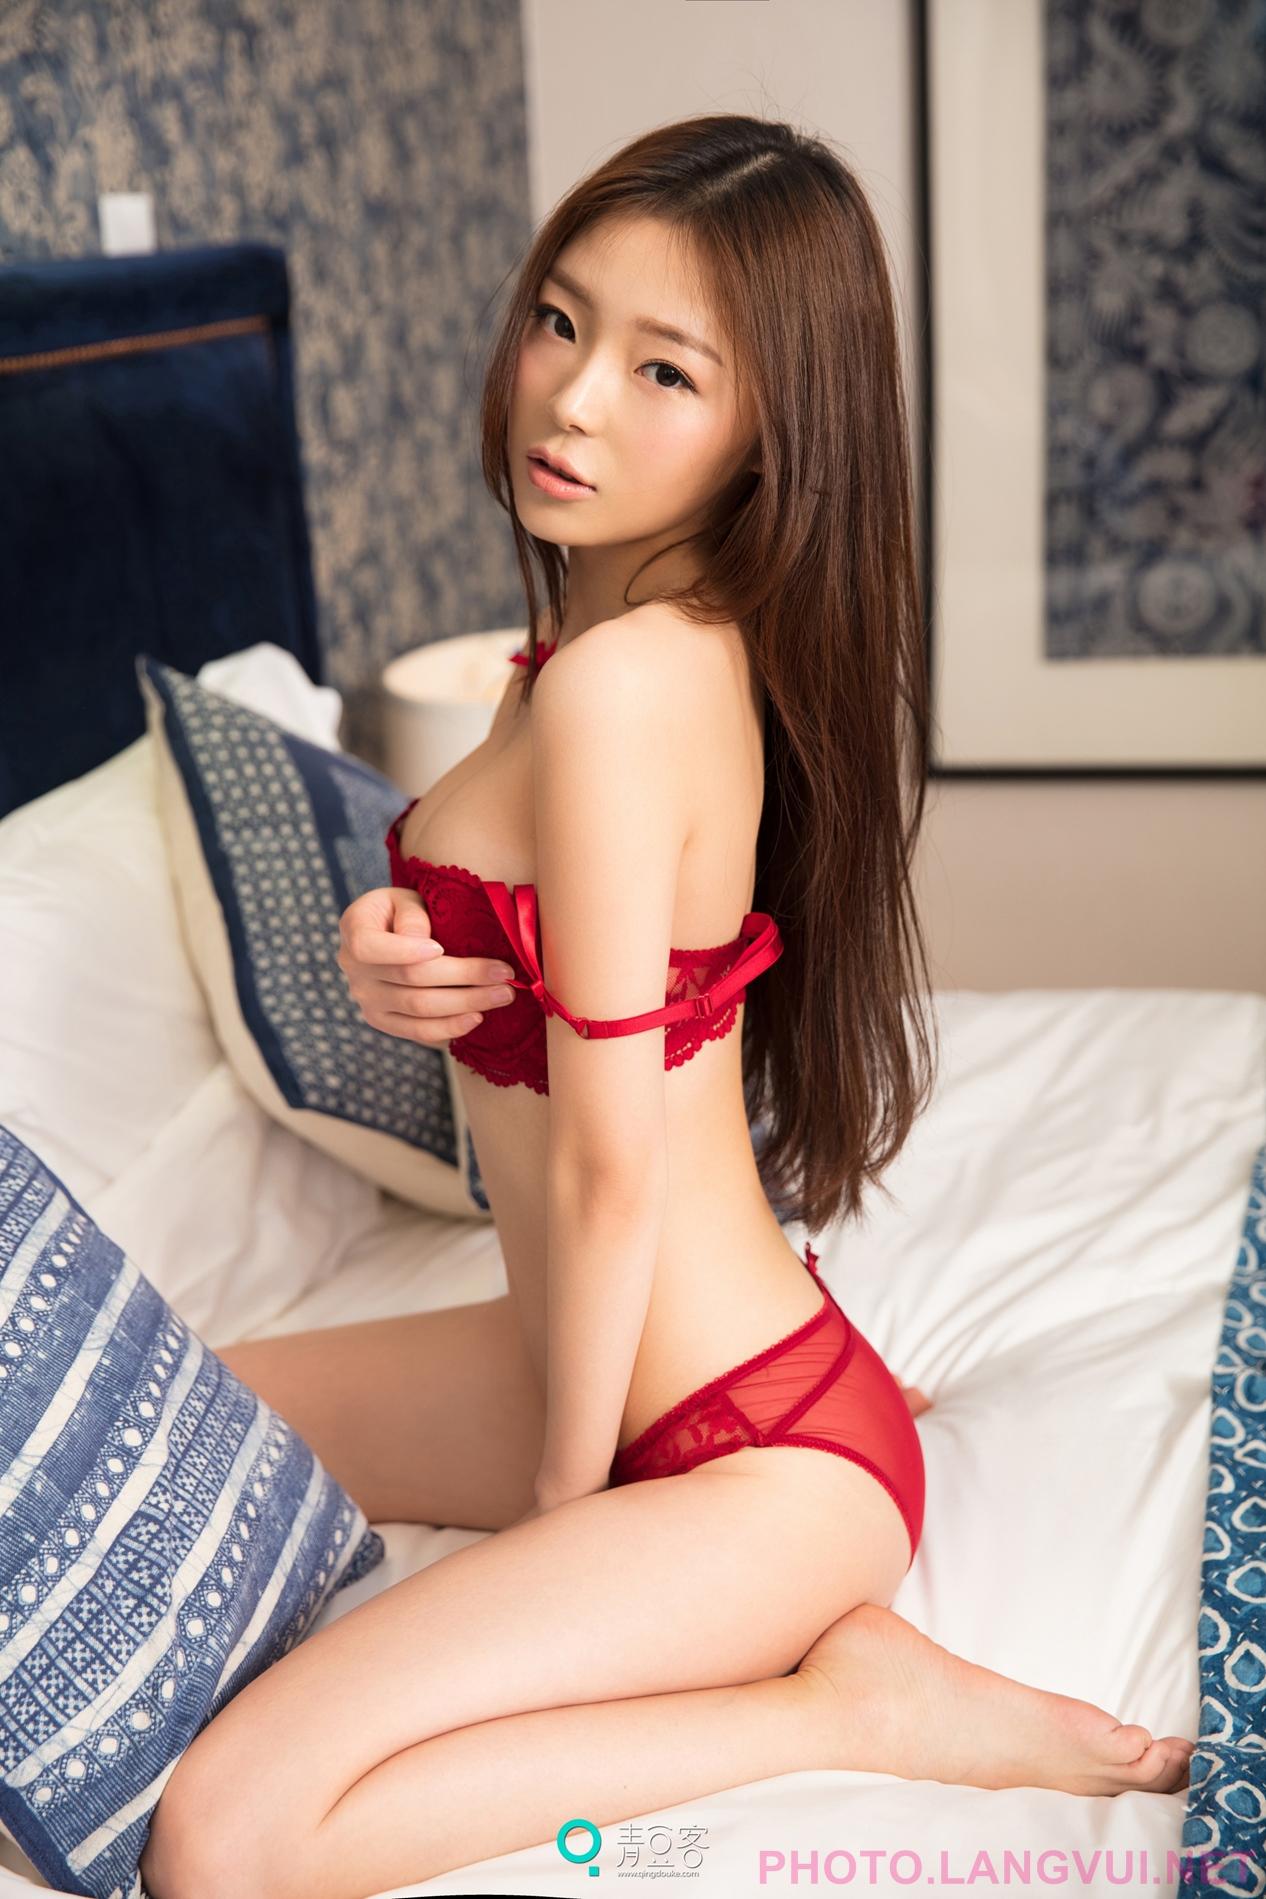 QingDouKe Vol 2017 07 12 Una